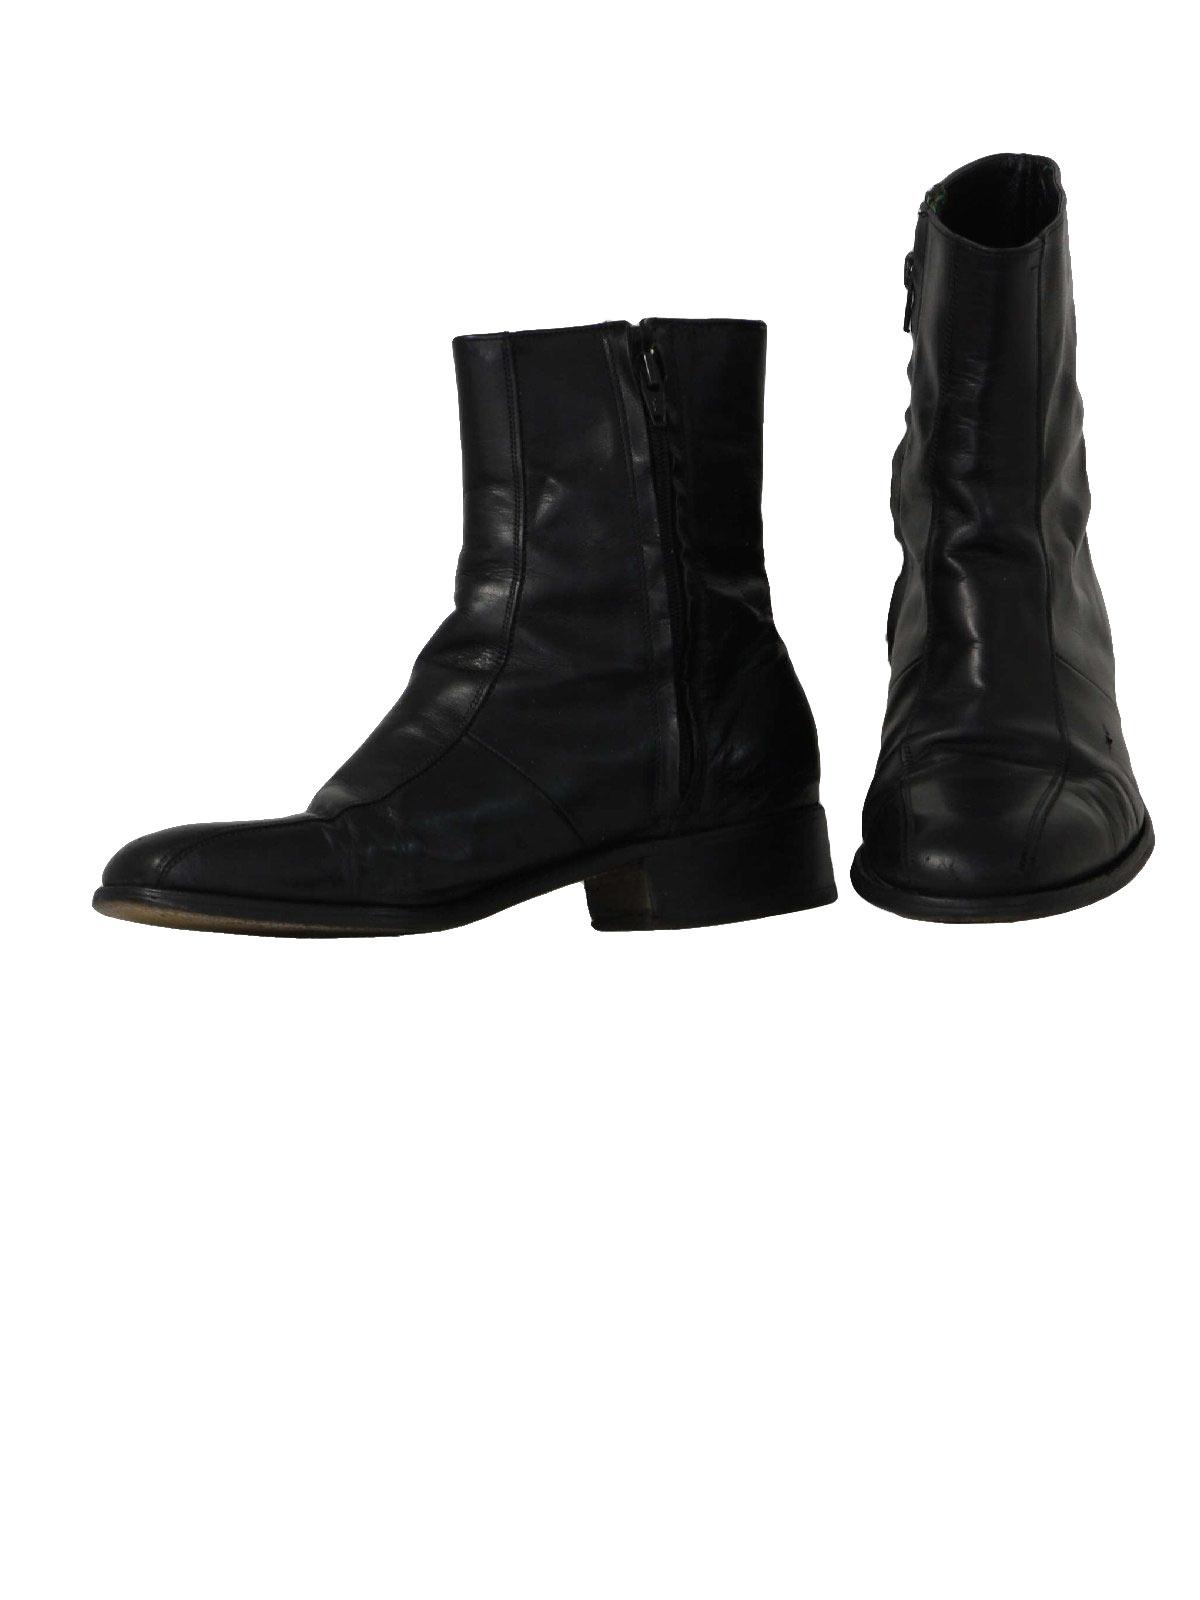 70s Retro Shoes: 70s -Florsheim- Mens black smooth leather mod ...